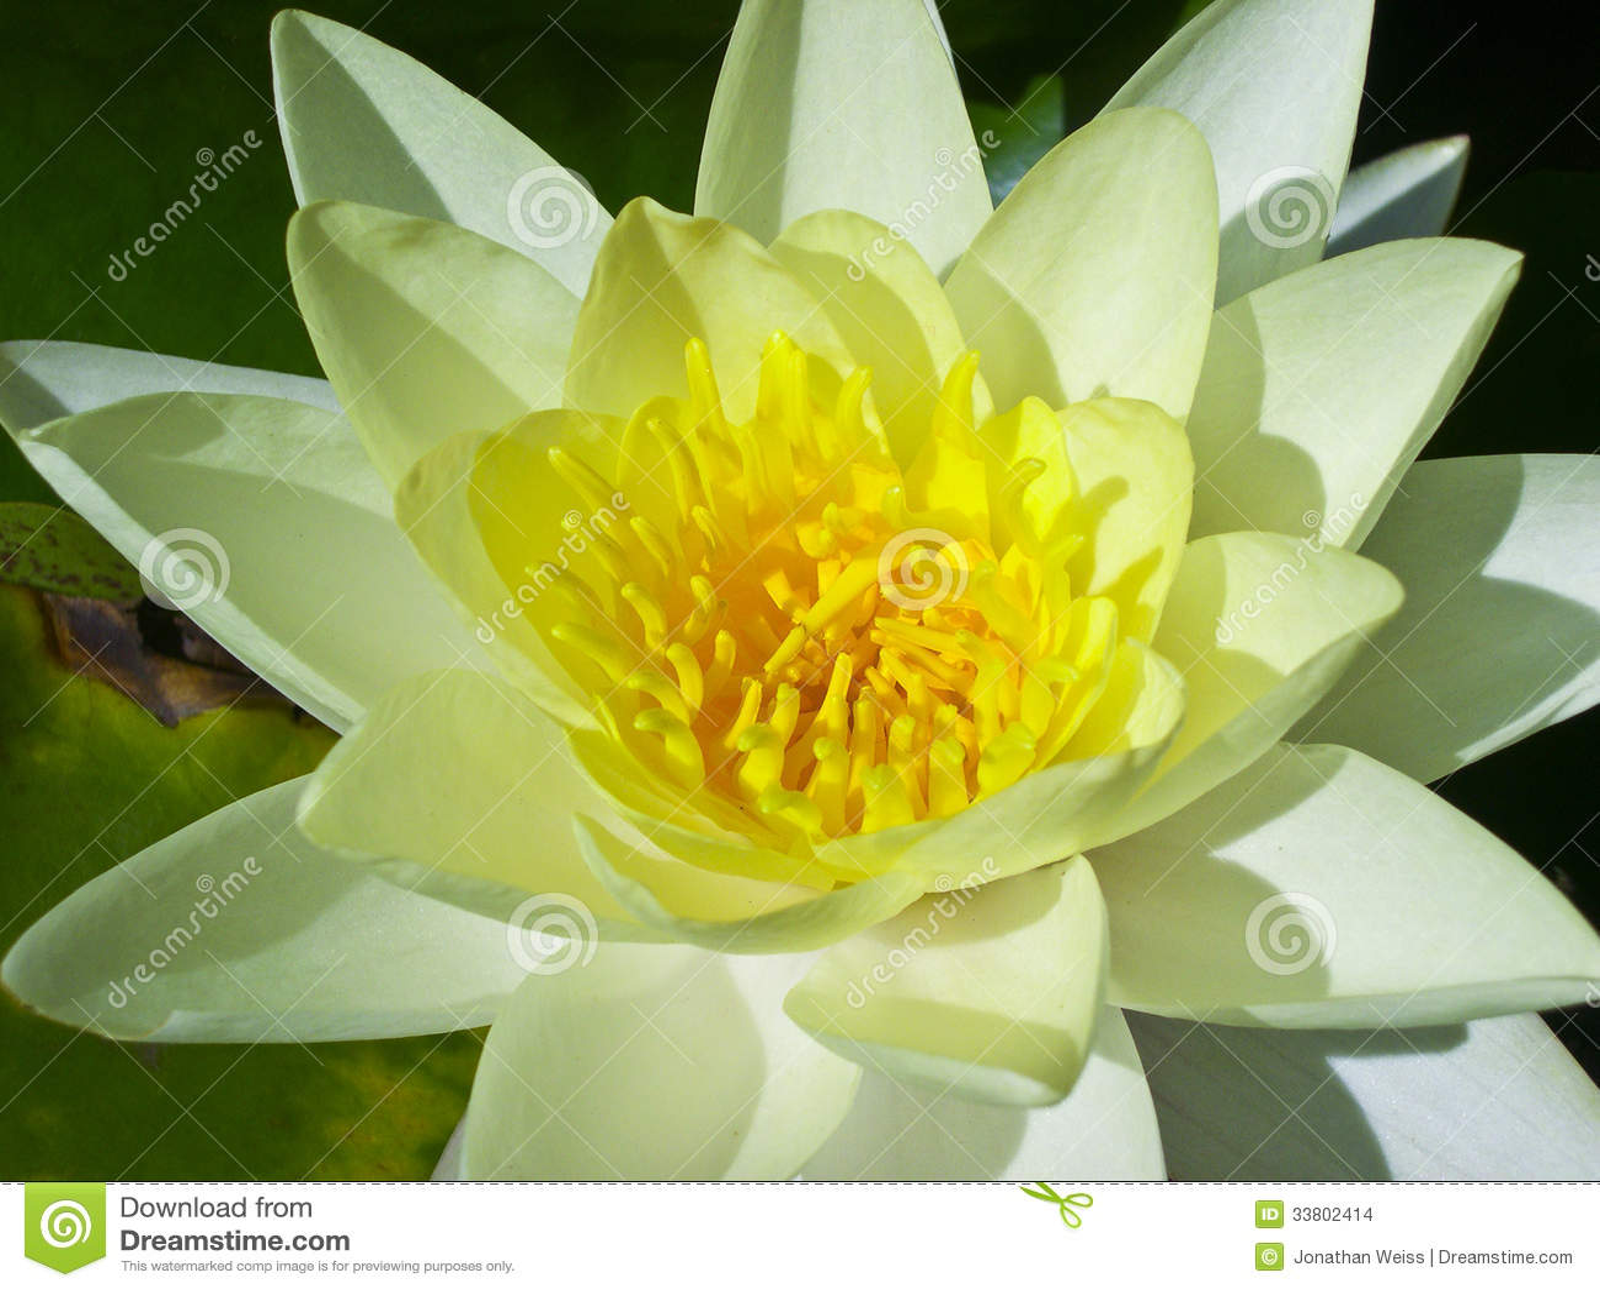 Green and yellow lily pad flower stock photo image of beautiful green and yellow lily pad flower izmirmasajfo